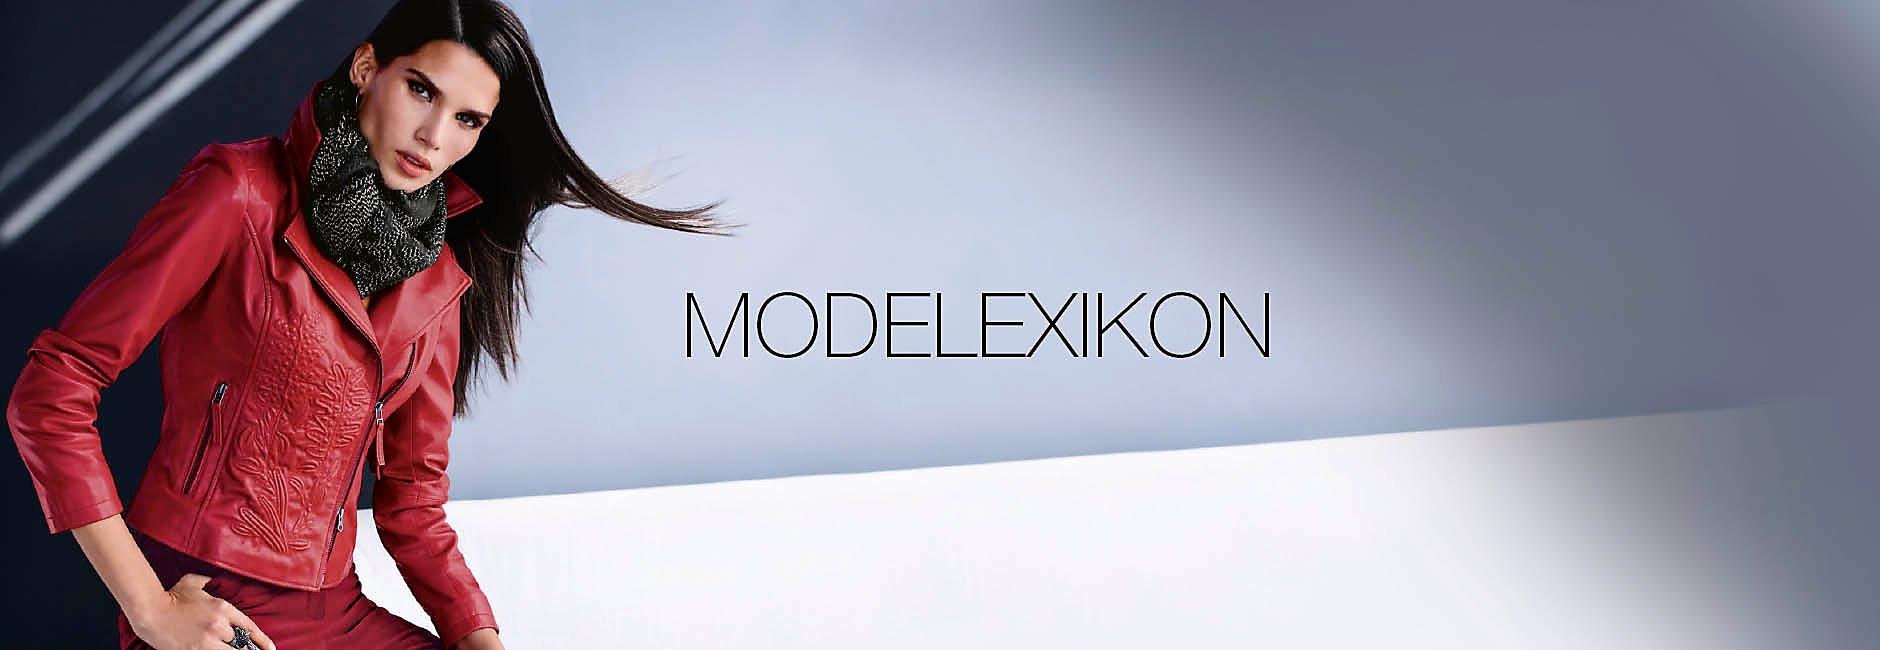 Modelexikon   MADELEINE Mode 032a4aeaa7